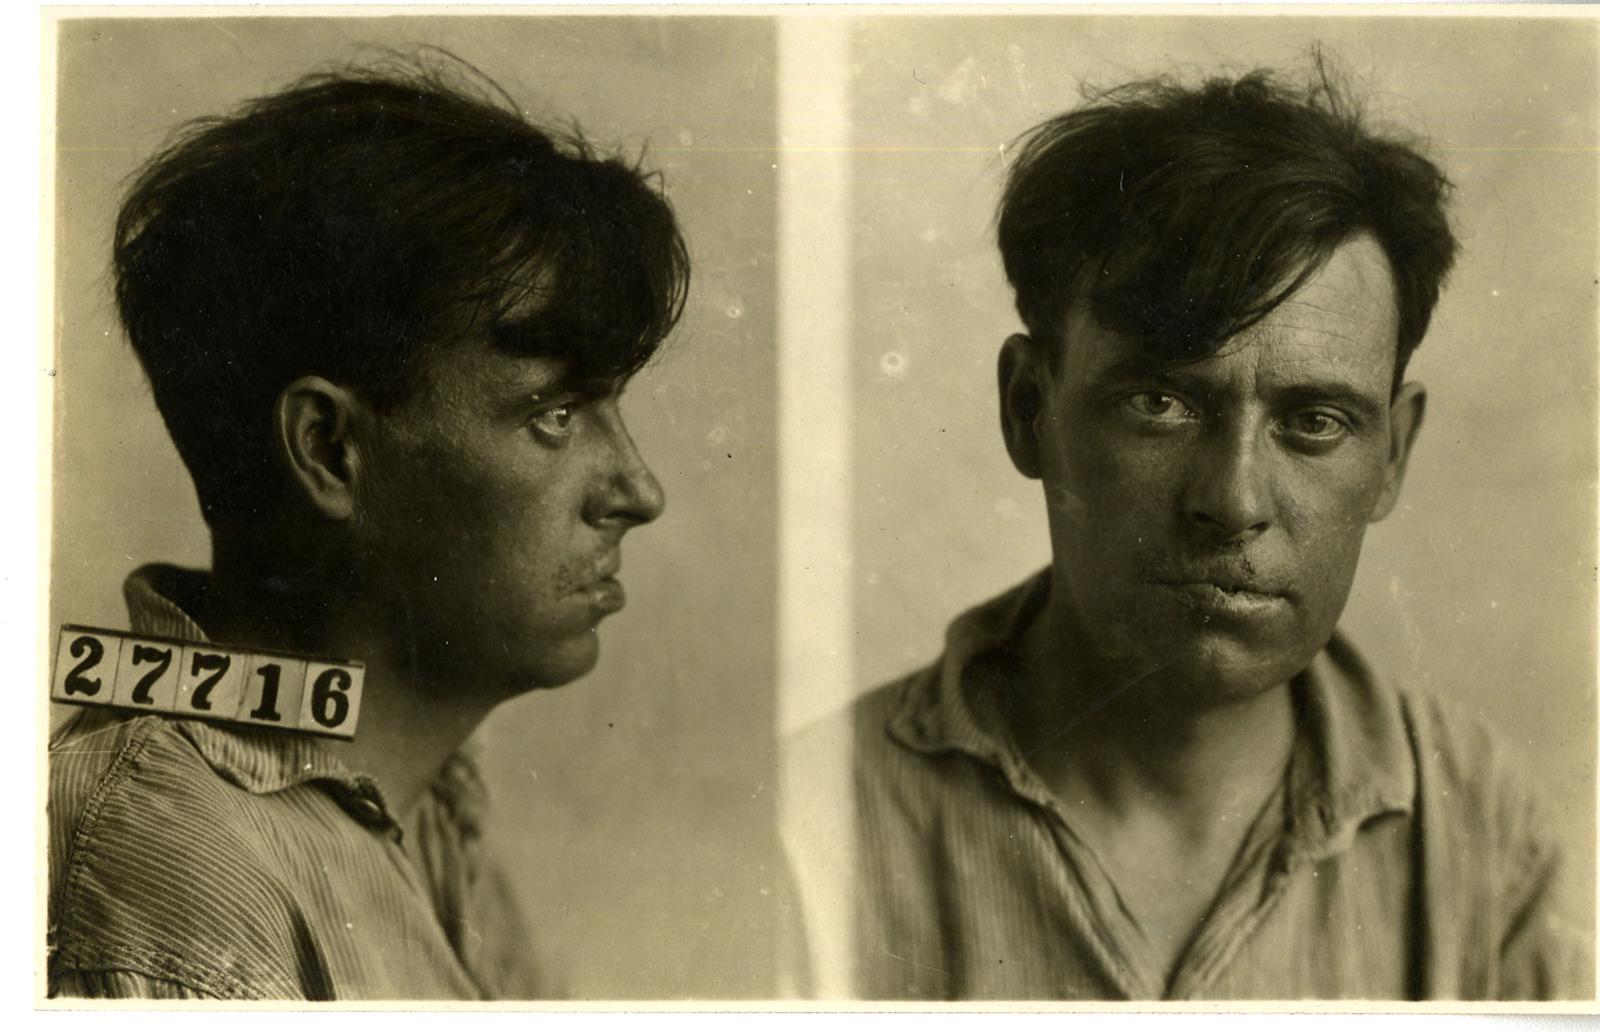 Photograph of Ray Stump